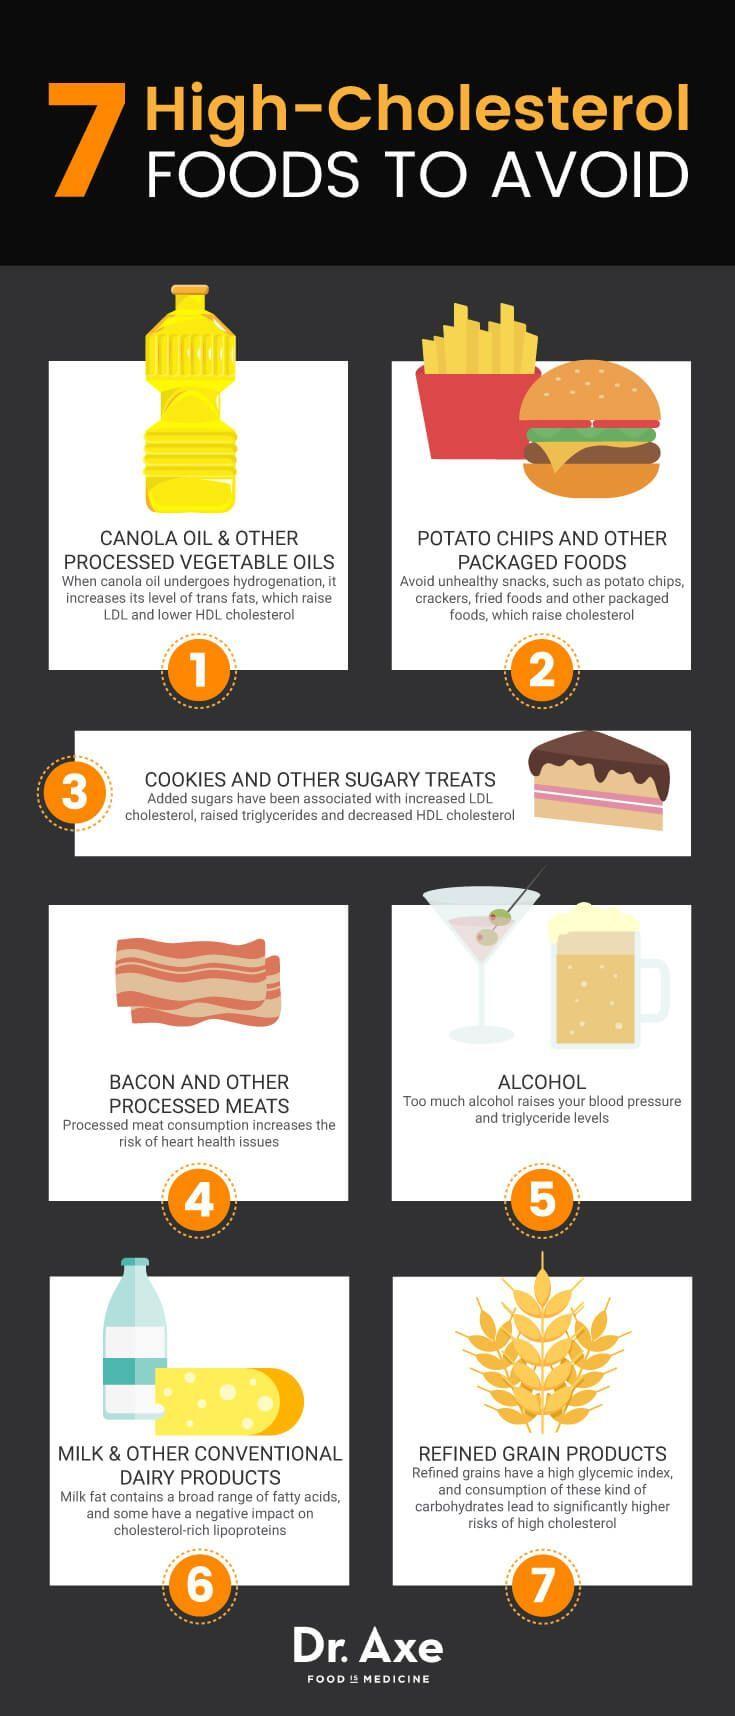 Hohe Triglyceride und Diät